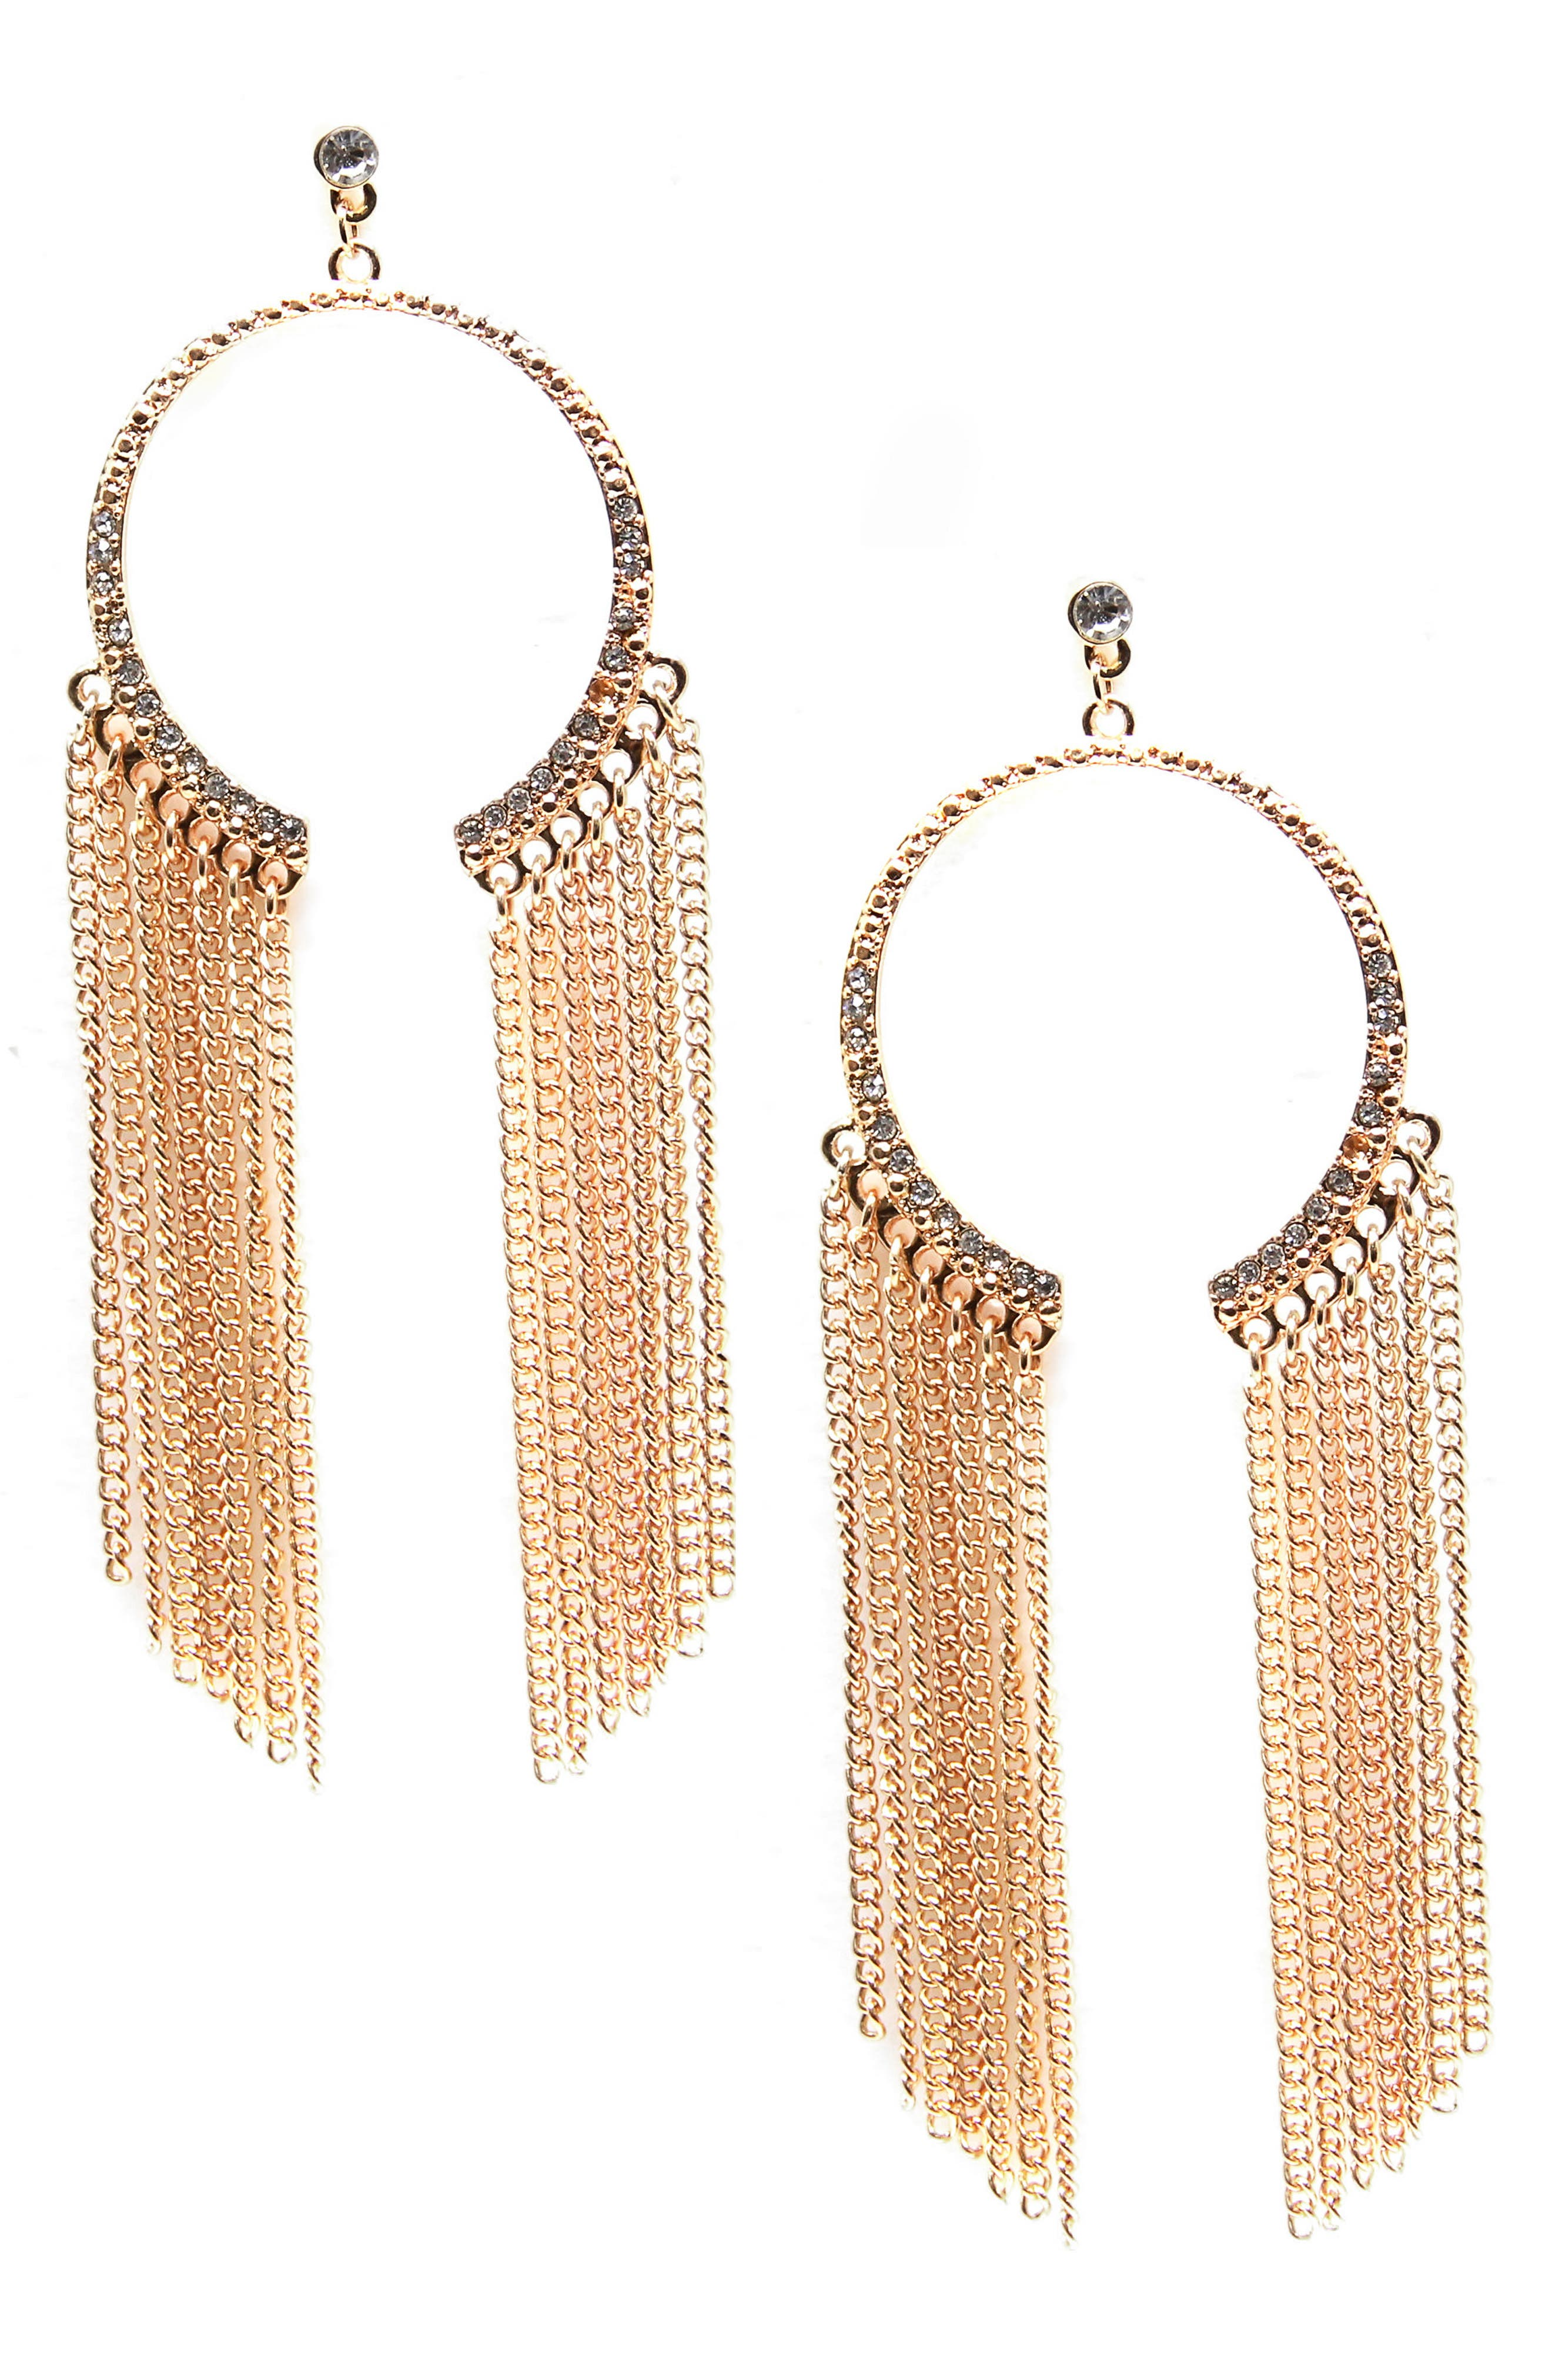 Chain & Crystal Hoop Earrings,                             Main thumbnail 1, color,                             710